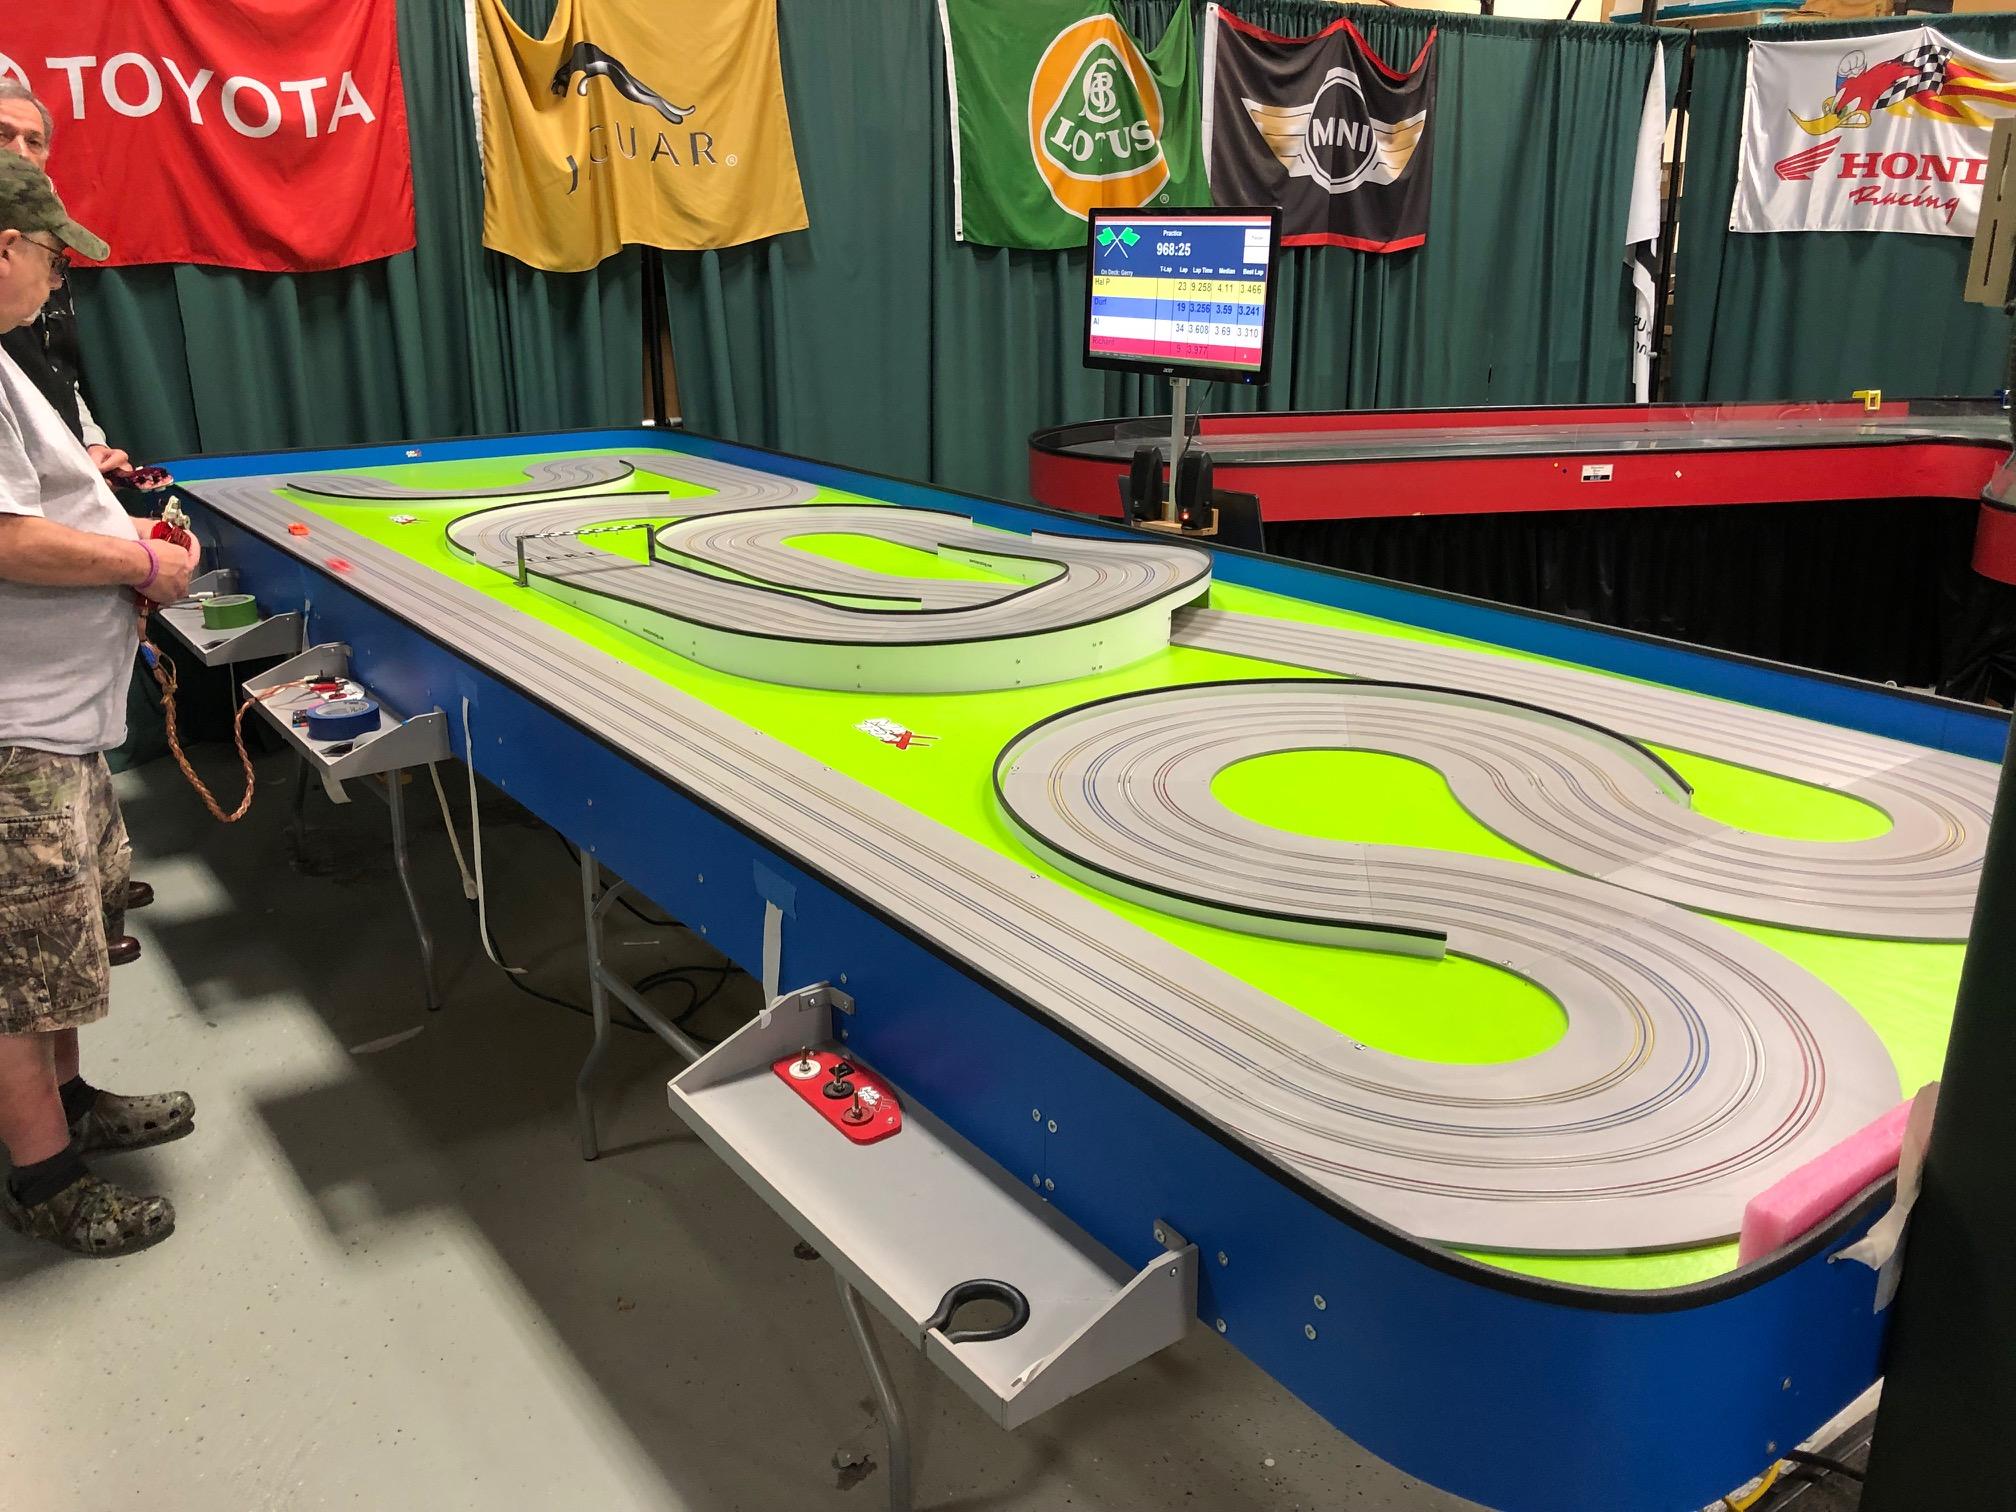 marc | New England HO Slot Car Racing!